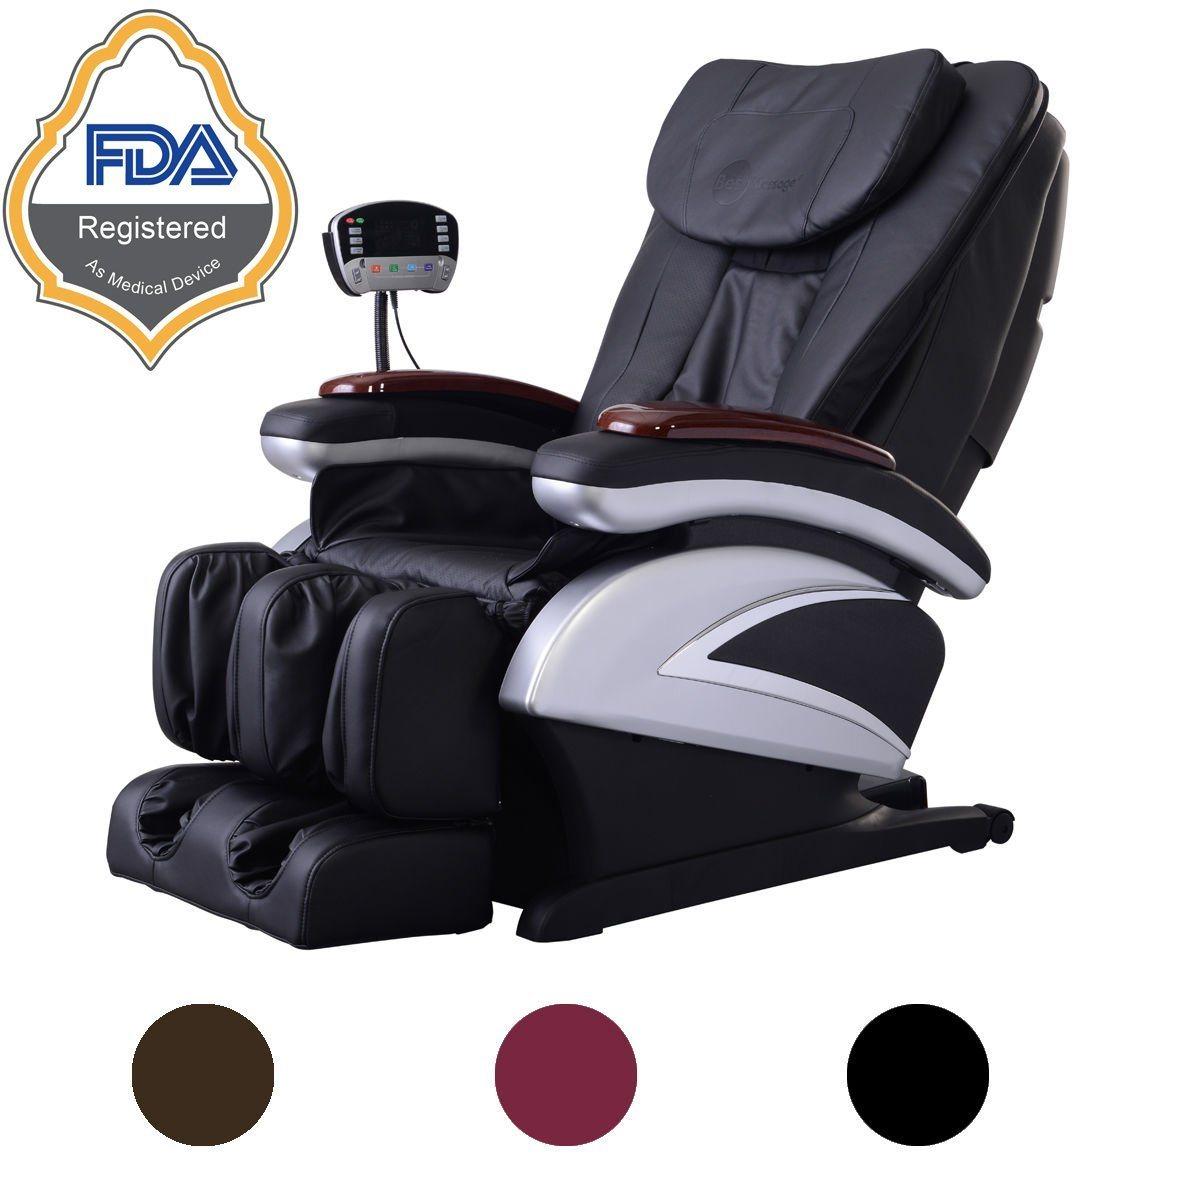 Electric_Full_Body_Shiatsu_Massage_Chair_Recliner